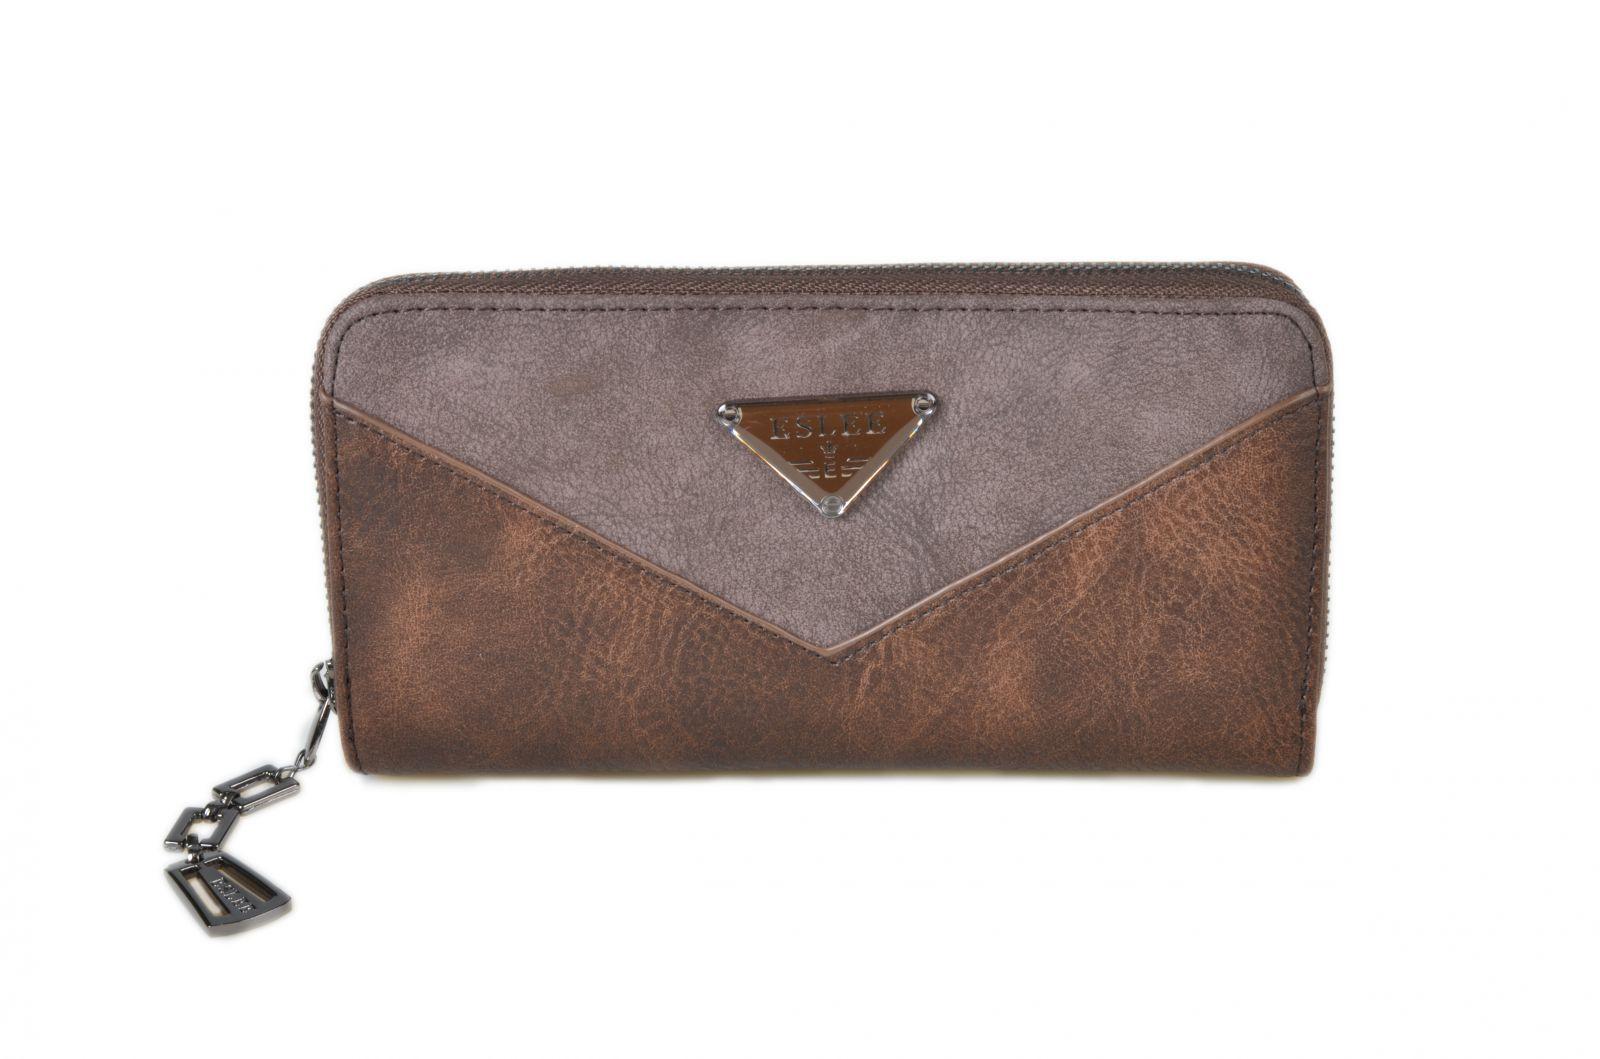 Dámská peněženka ESLEE 6392 brown E-batoh